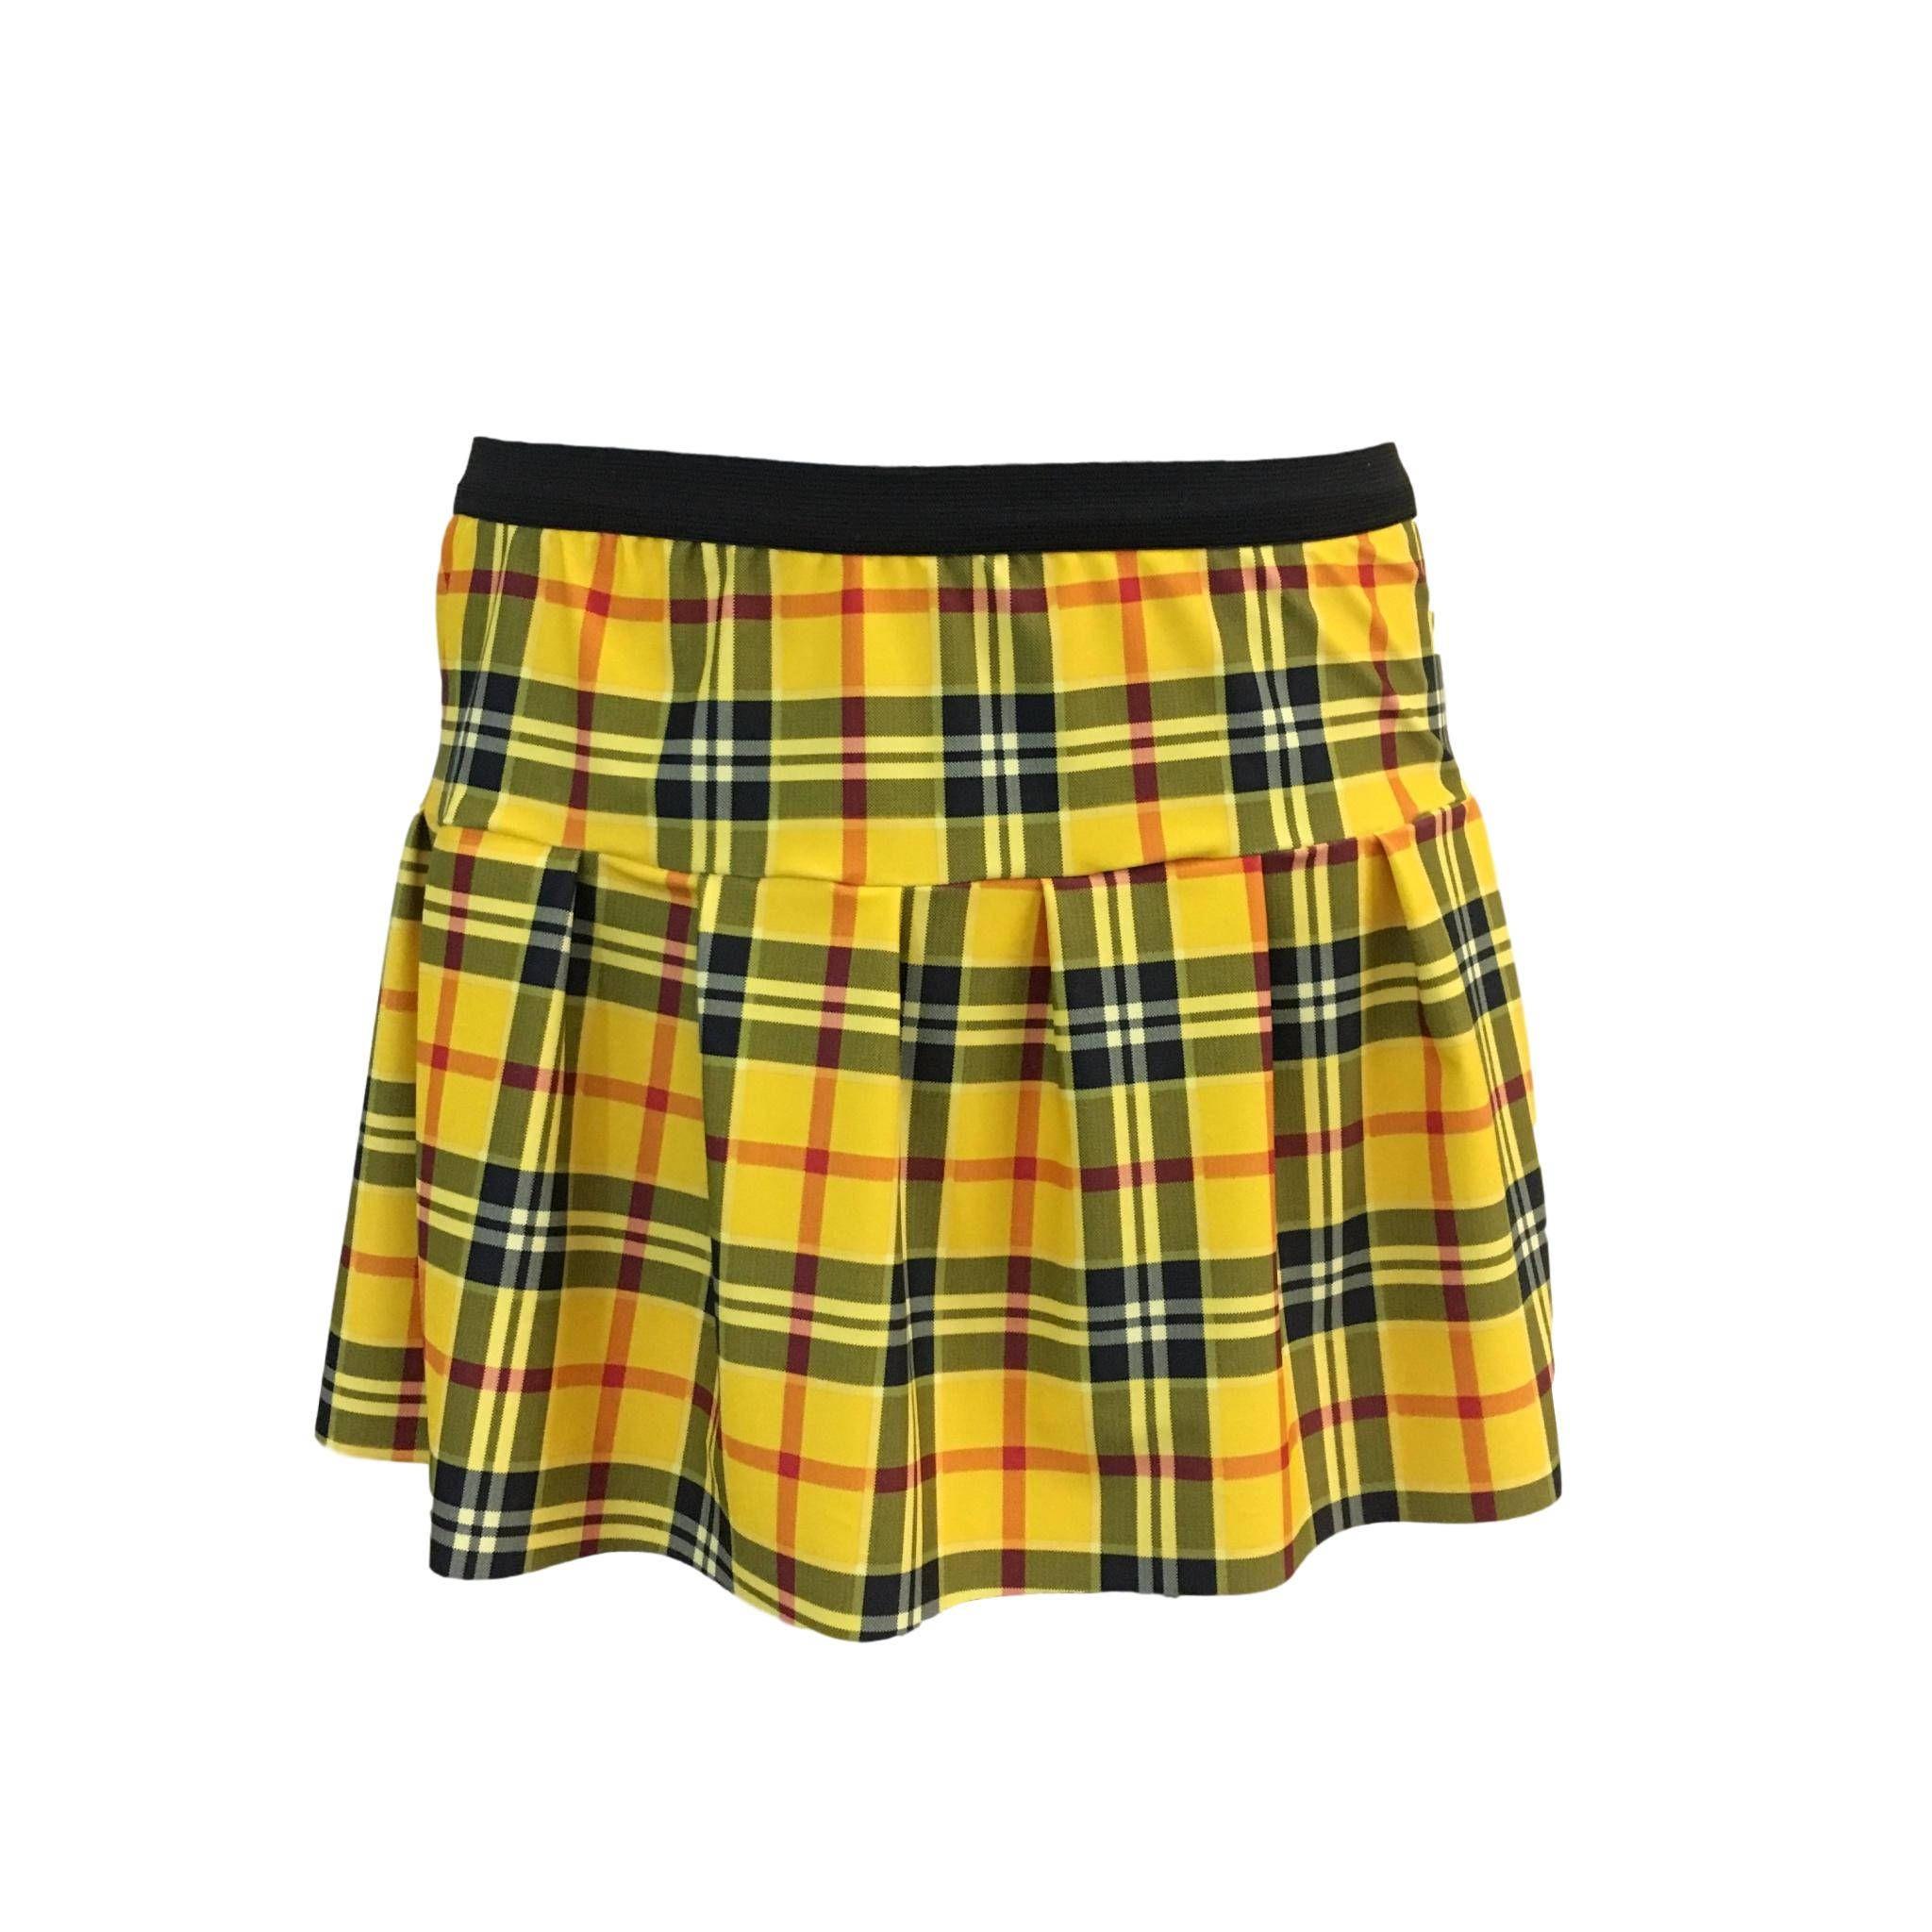 cc0b88fae Plaid Yellow Running Skirt | Christmas Skirt | Irish Skirt | School Girl  Skirt | Darla Finding Demo | Yellow Plaid Skirt by RockCitySkirts on Etsy